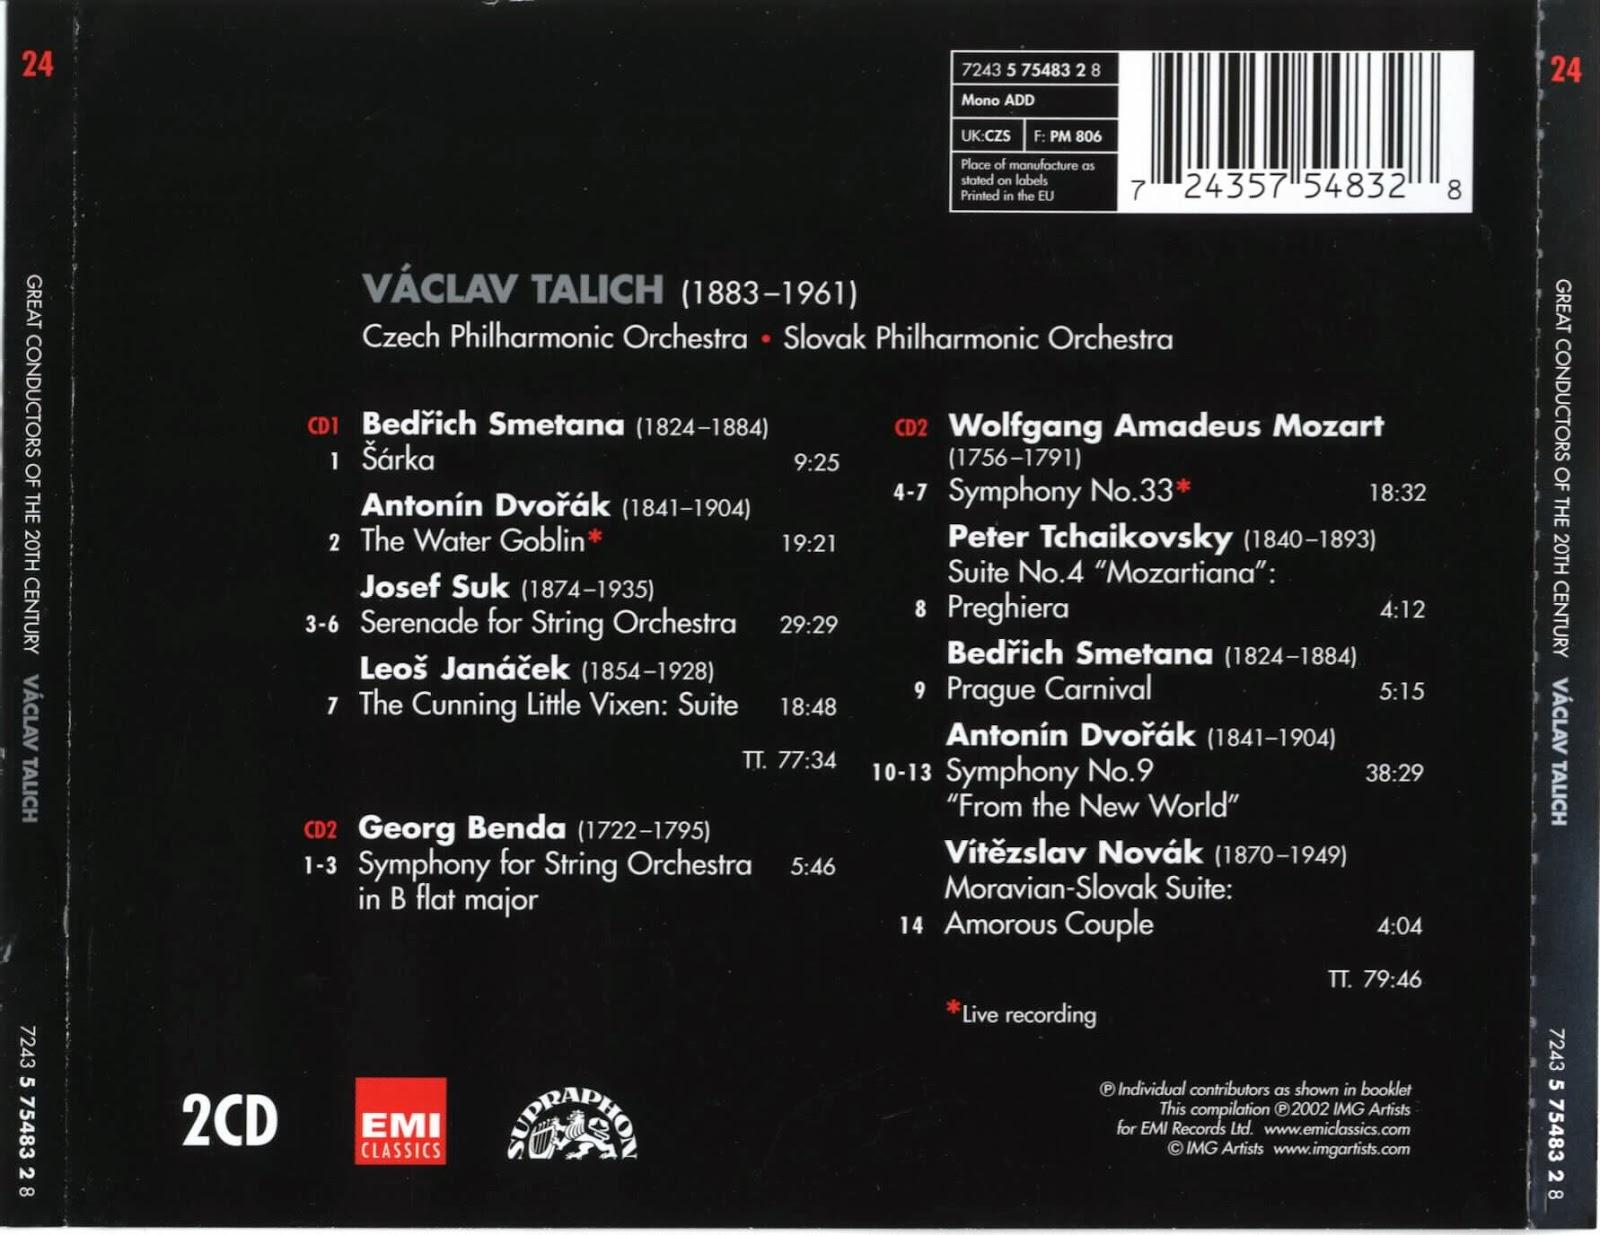 Václav Talich - Pyotr Ilyich Tchaikovsky P. I. Čajkovskij Talichovský Archiv III.